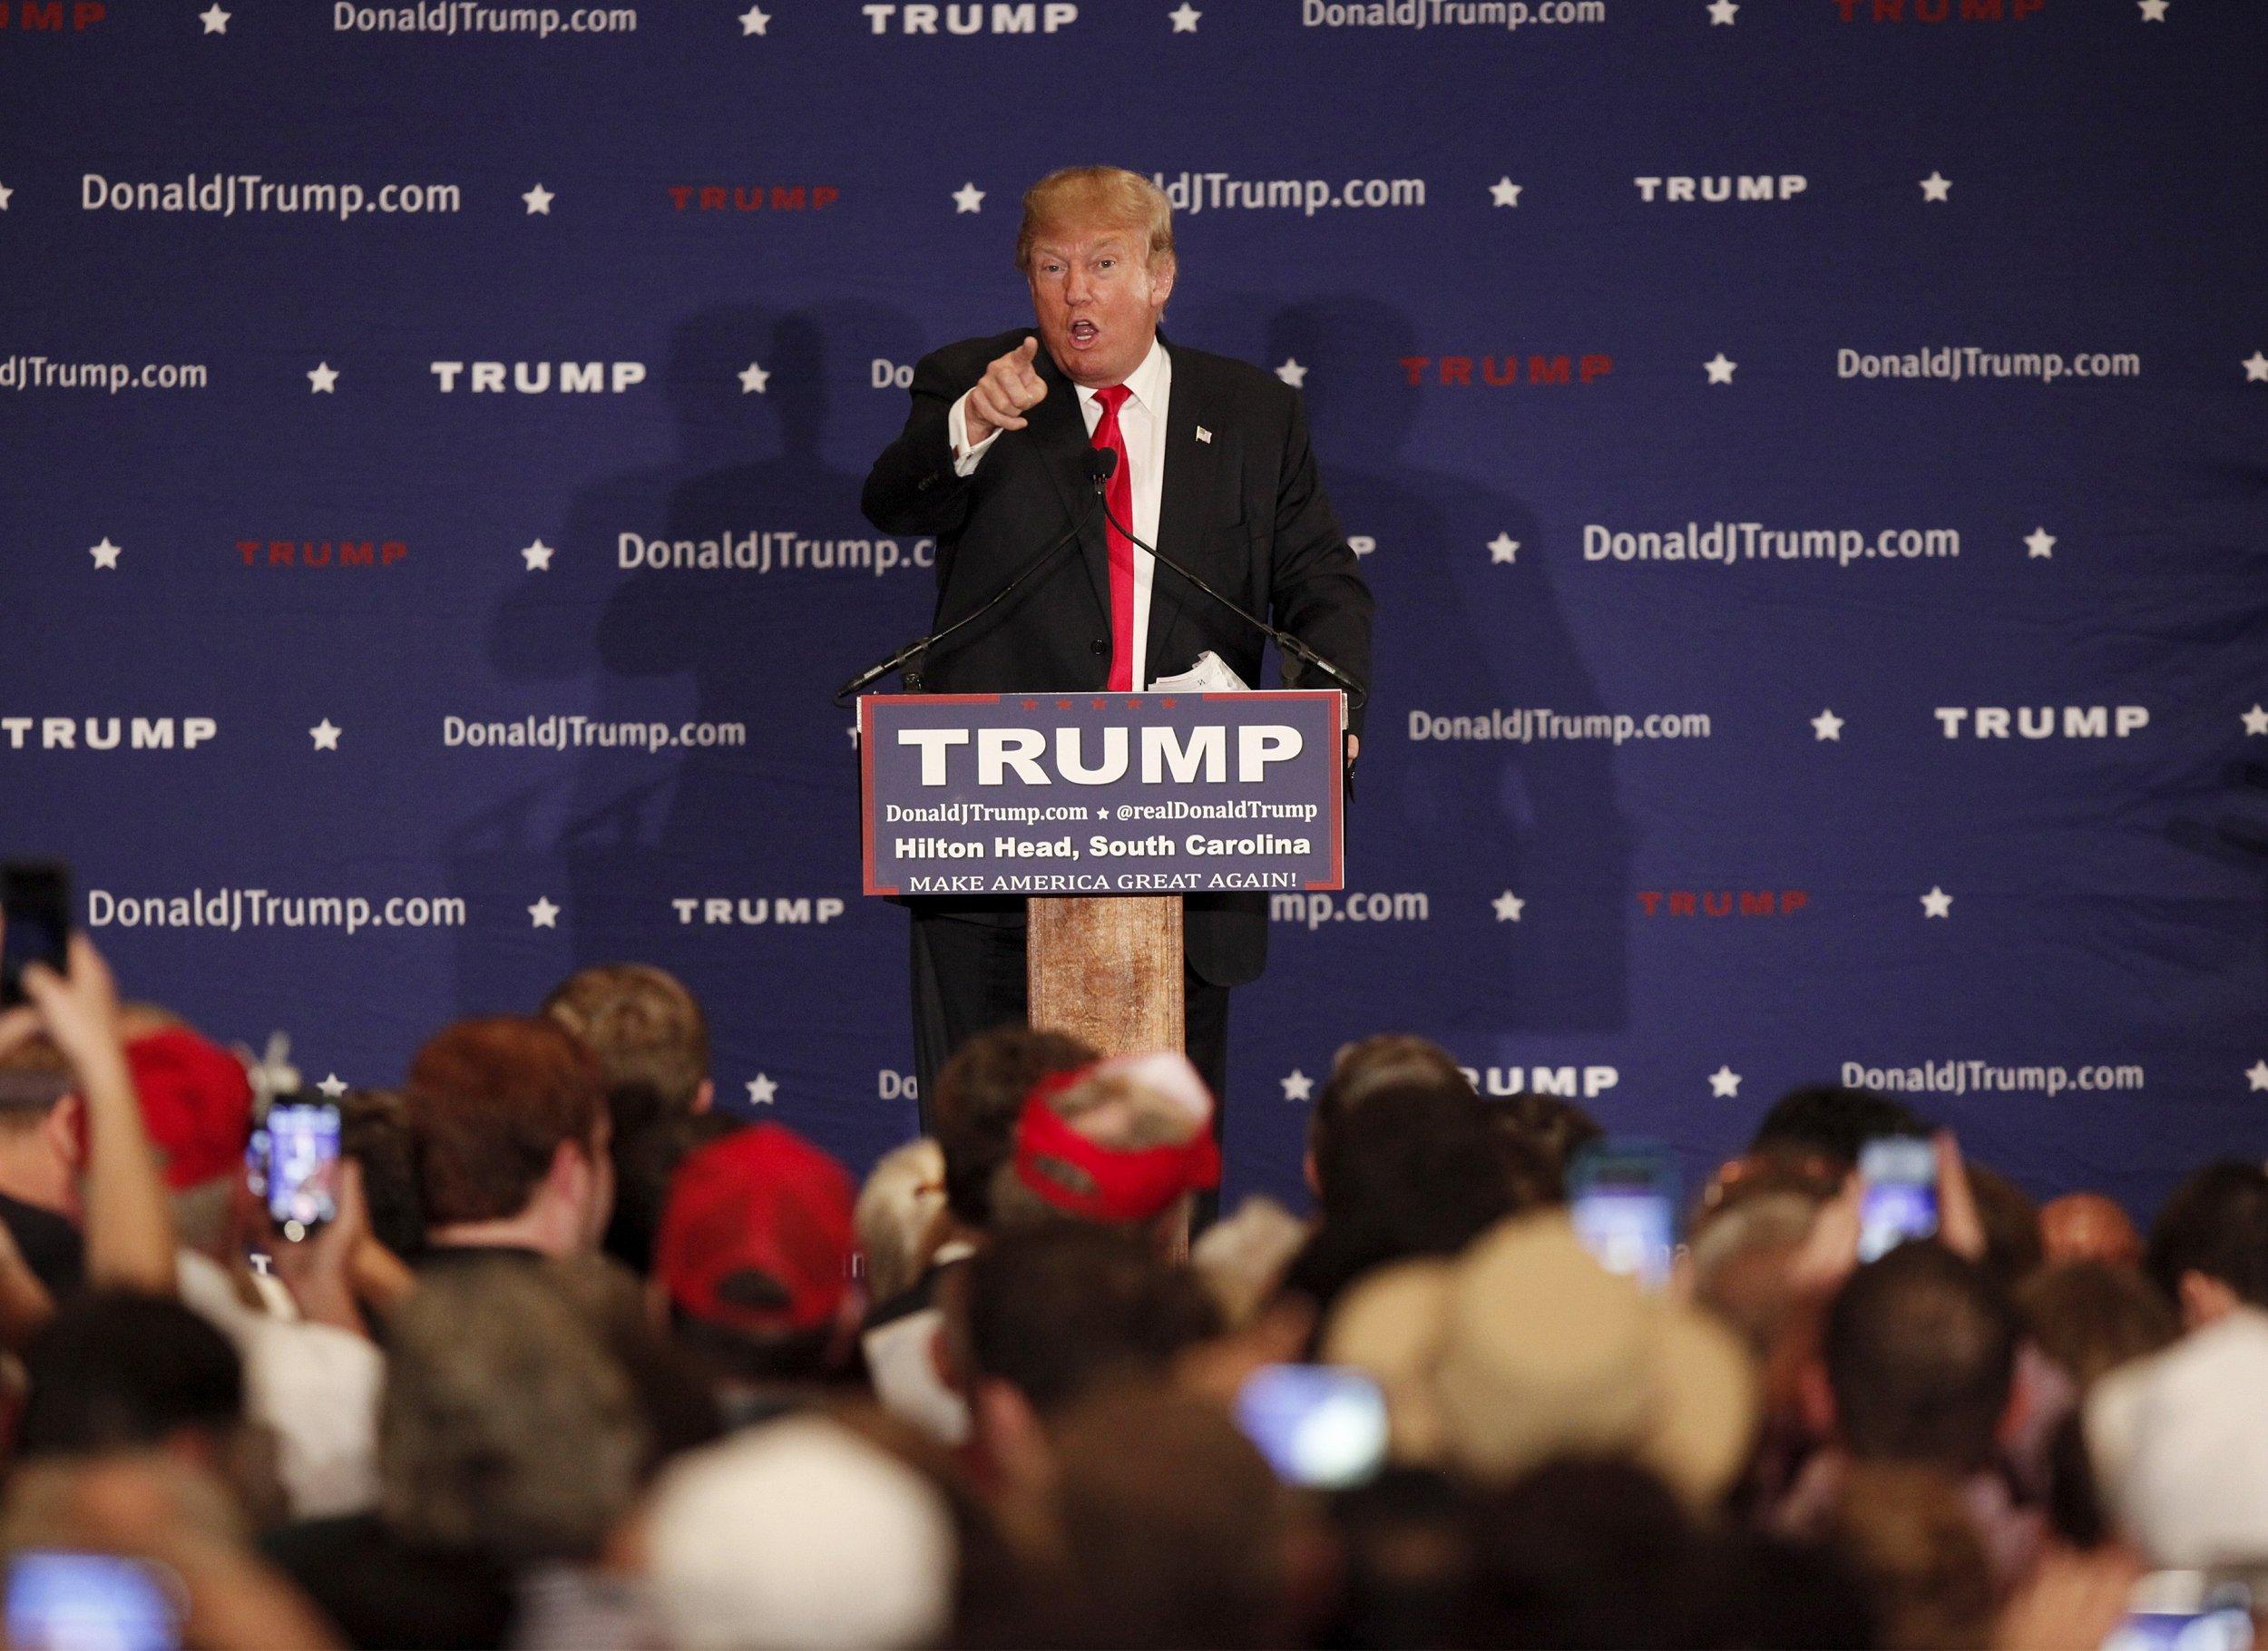 0104_Donald_Trump_first_ad_01